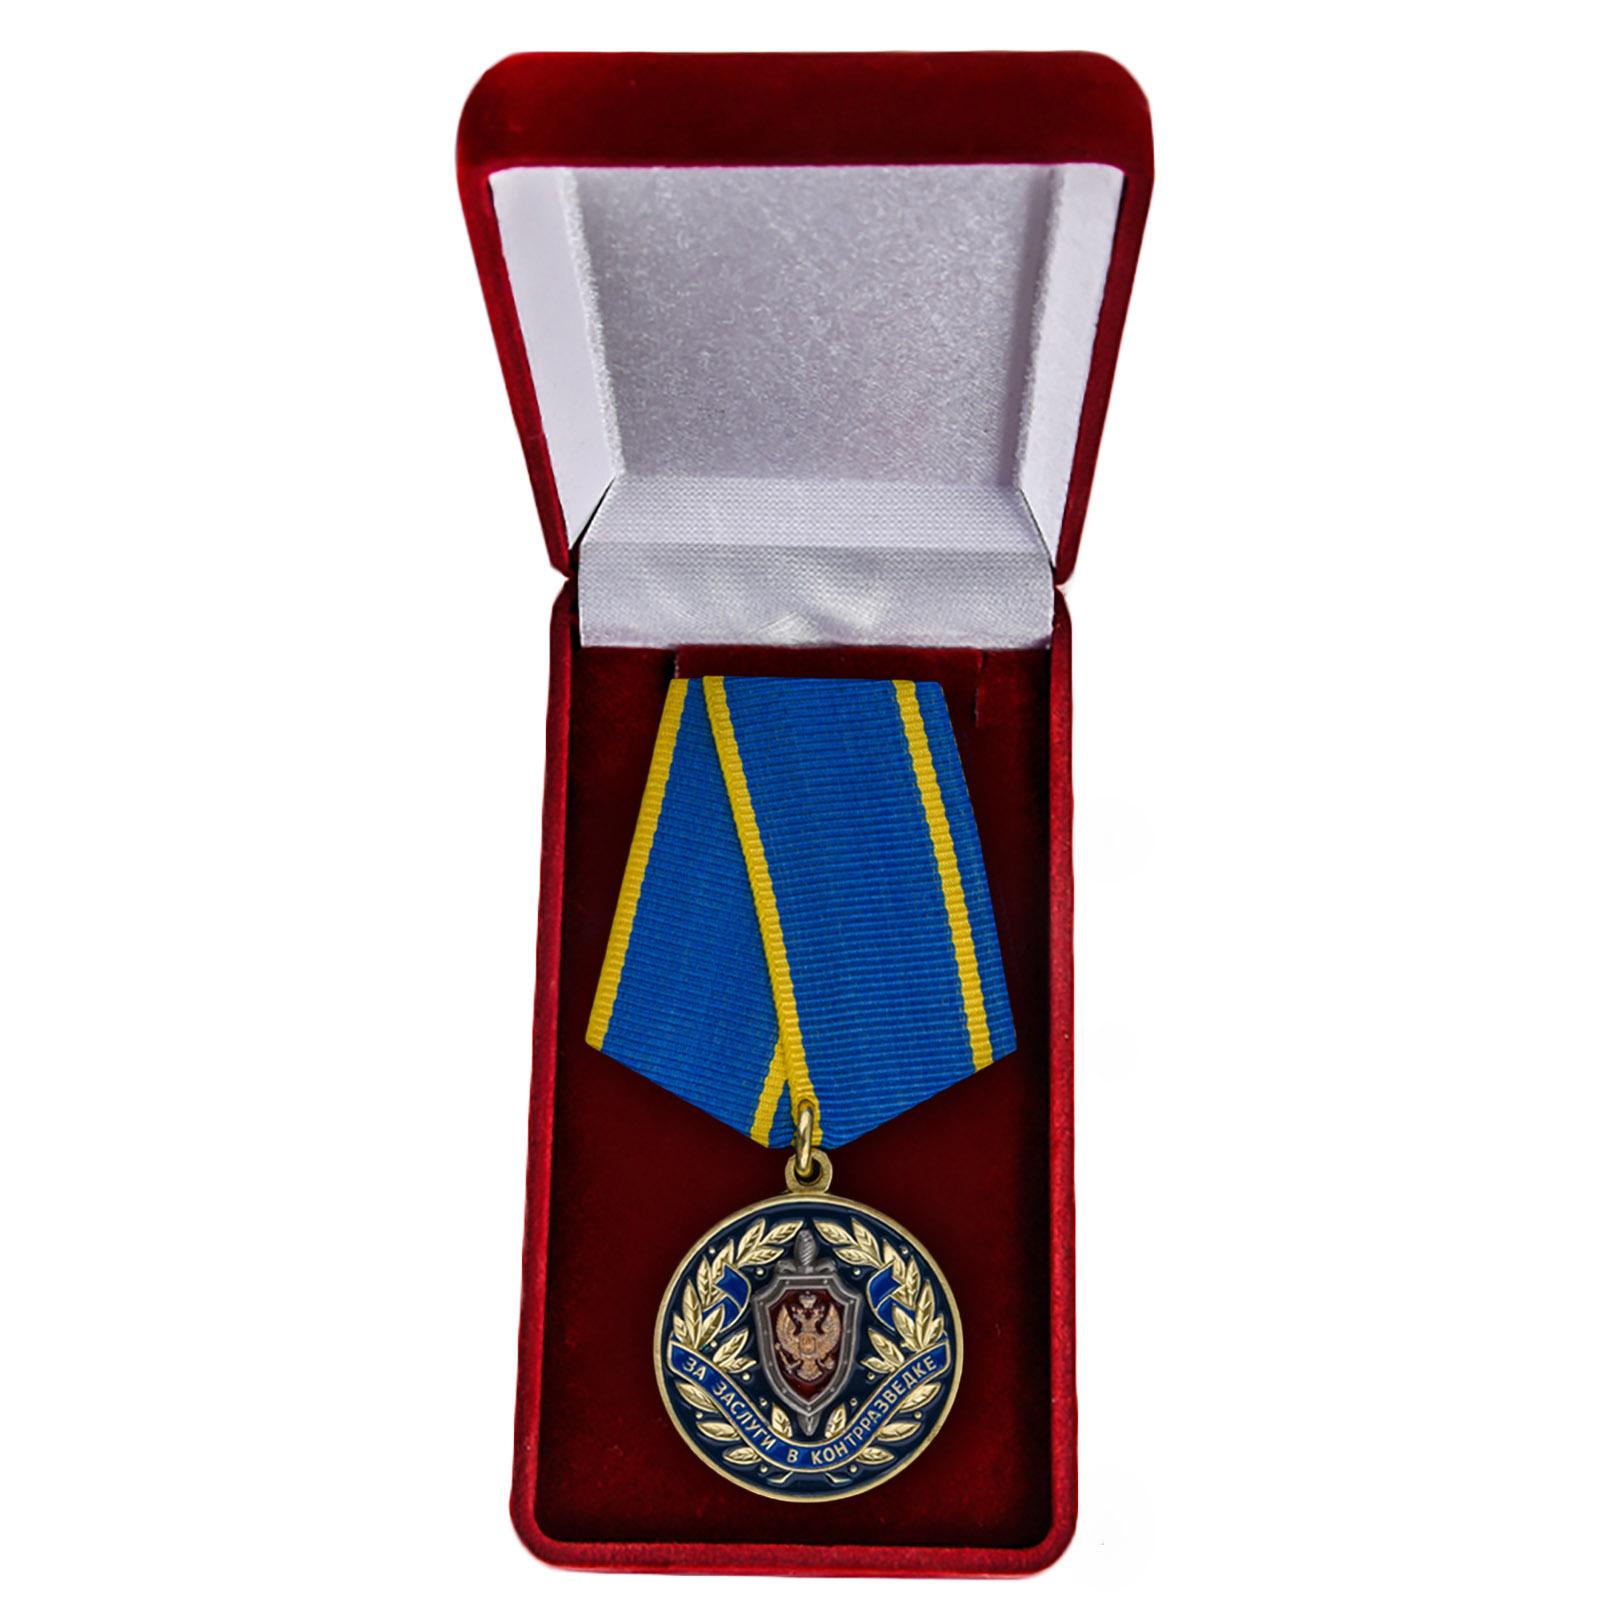 "Медаль ""За заслуги в контрразведке"" в футляре"